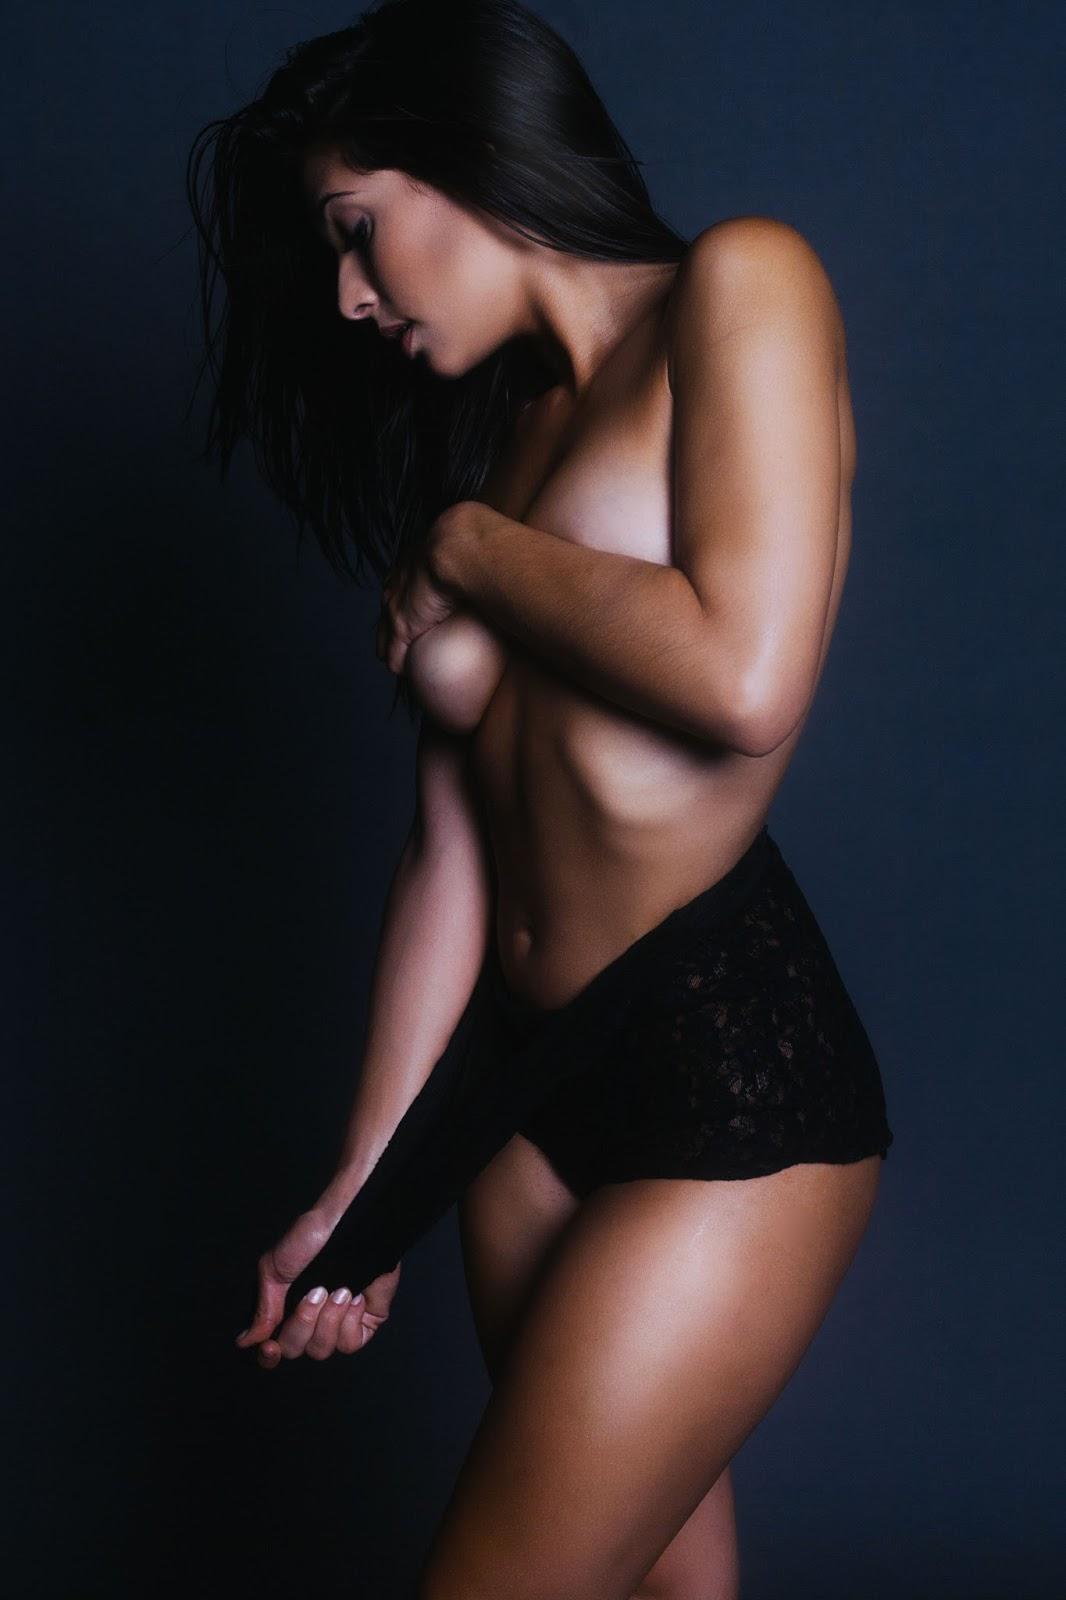 Topless Pics Of Camila Ba...